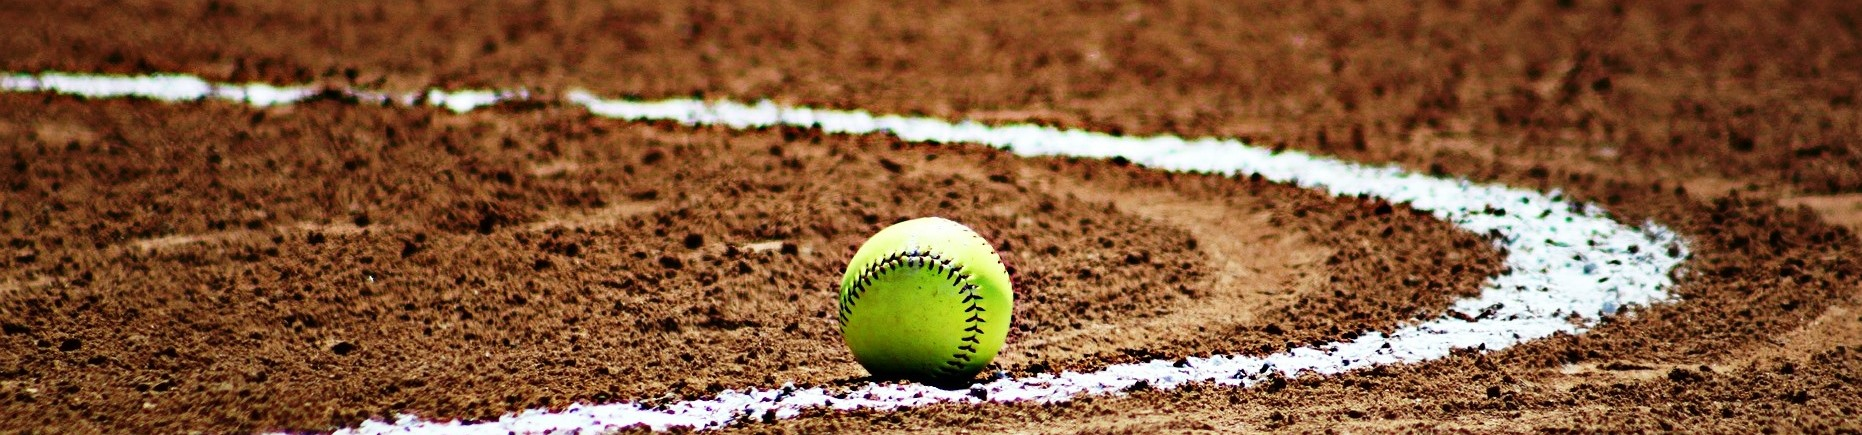 Softball 372979 19201